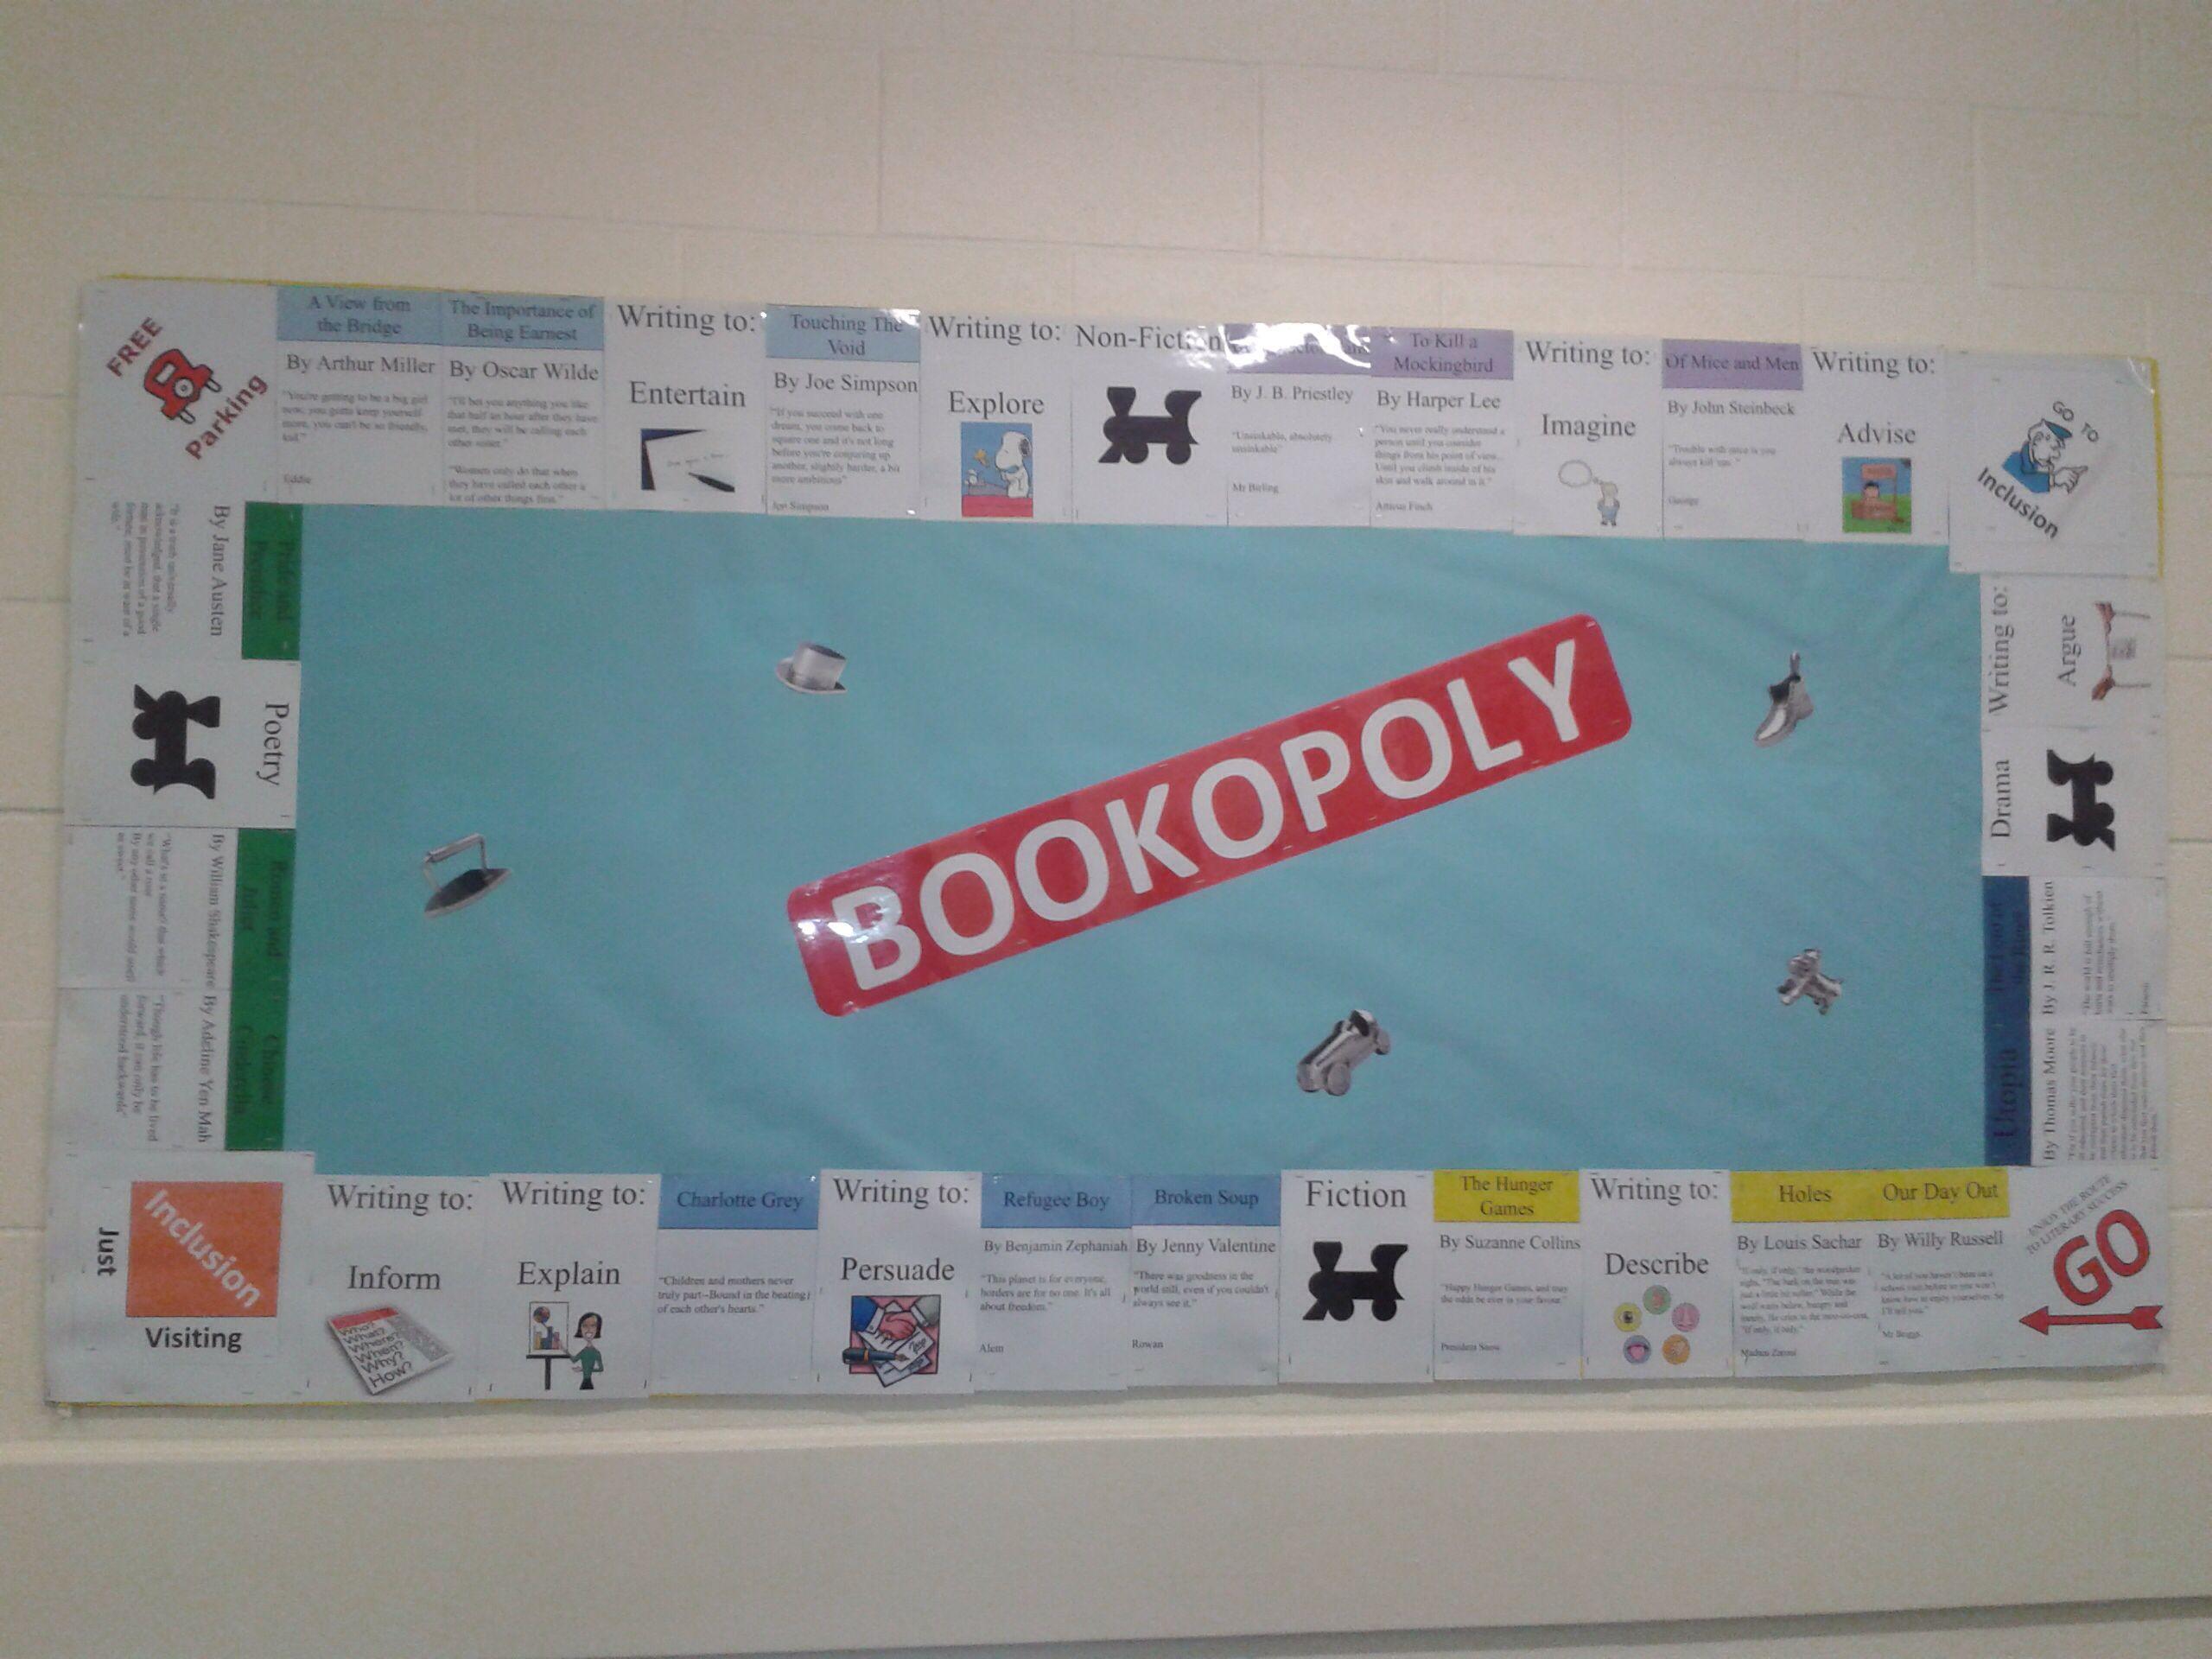 My uk version of secondary curriculum bookopoly display